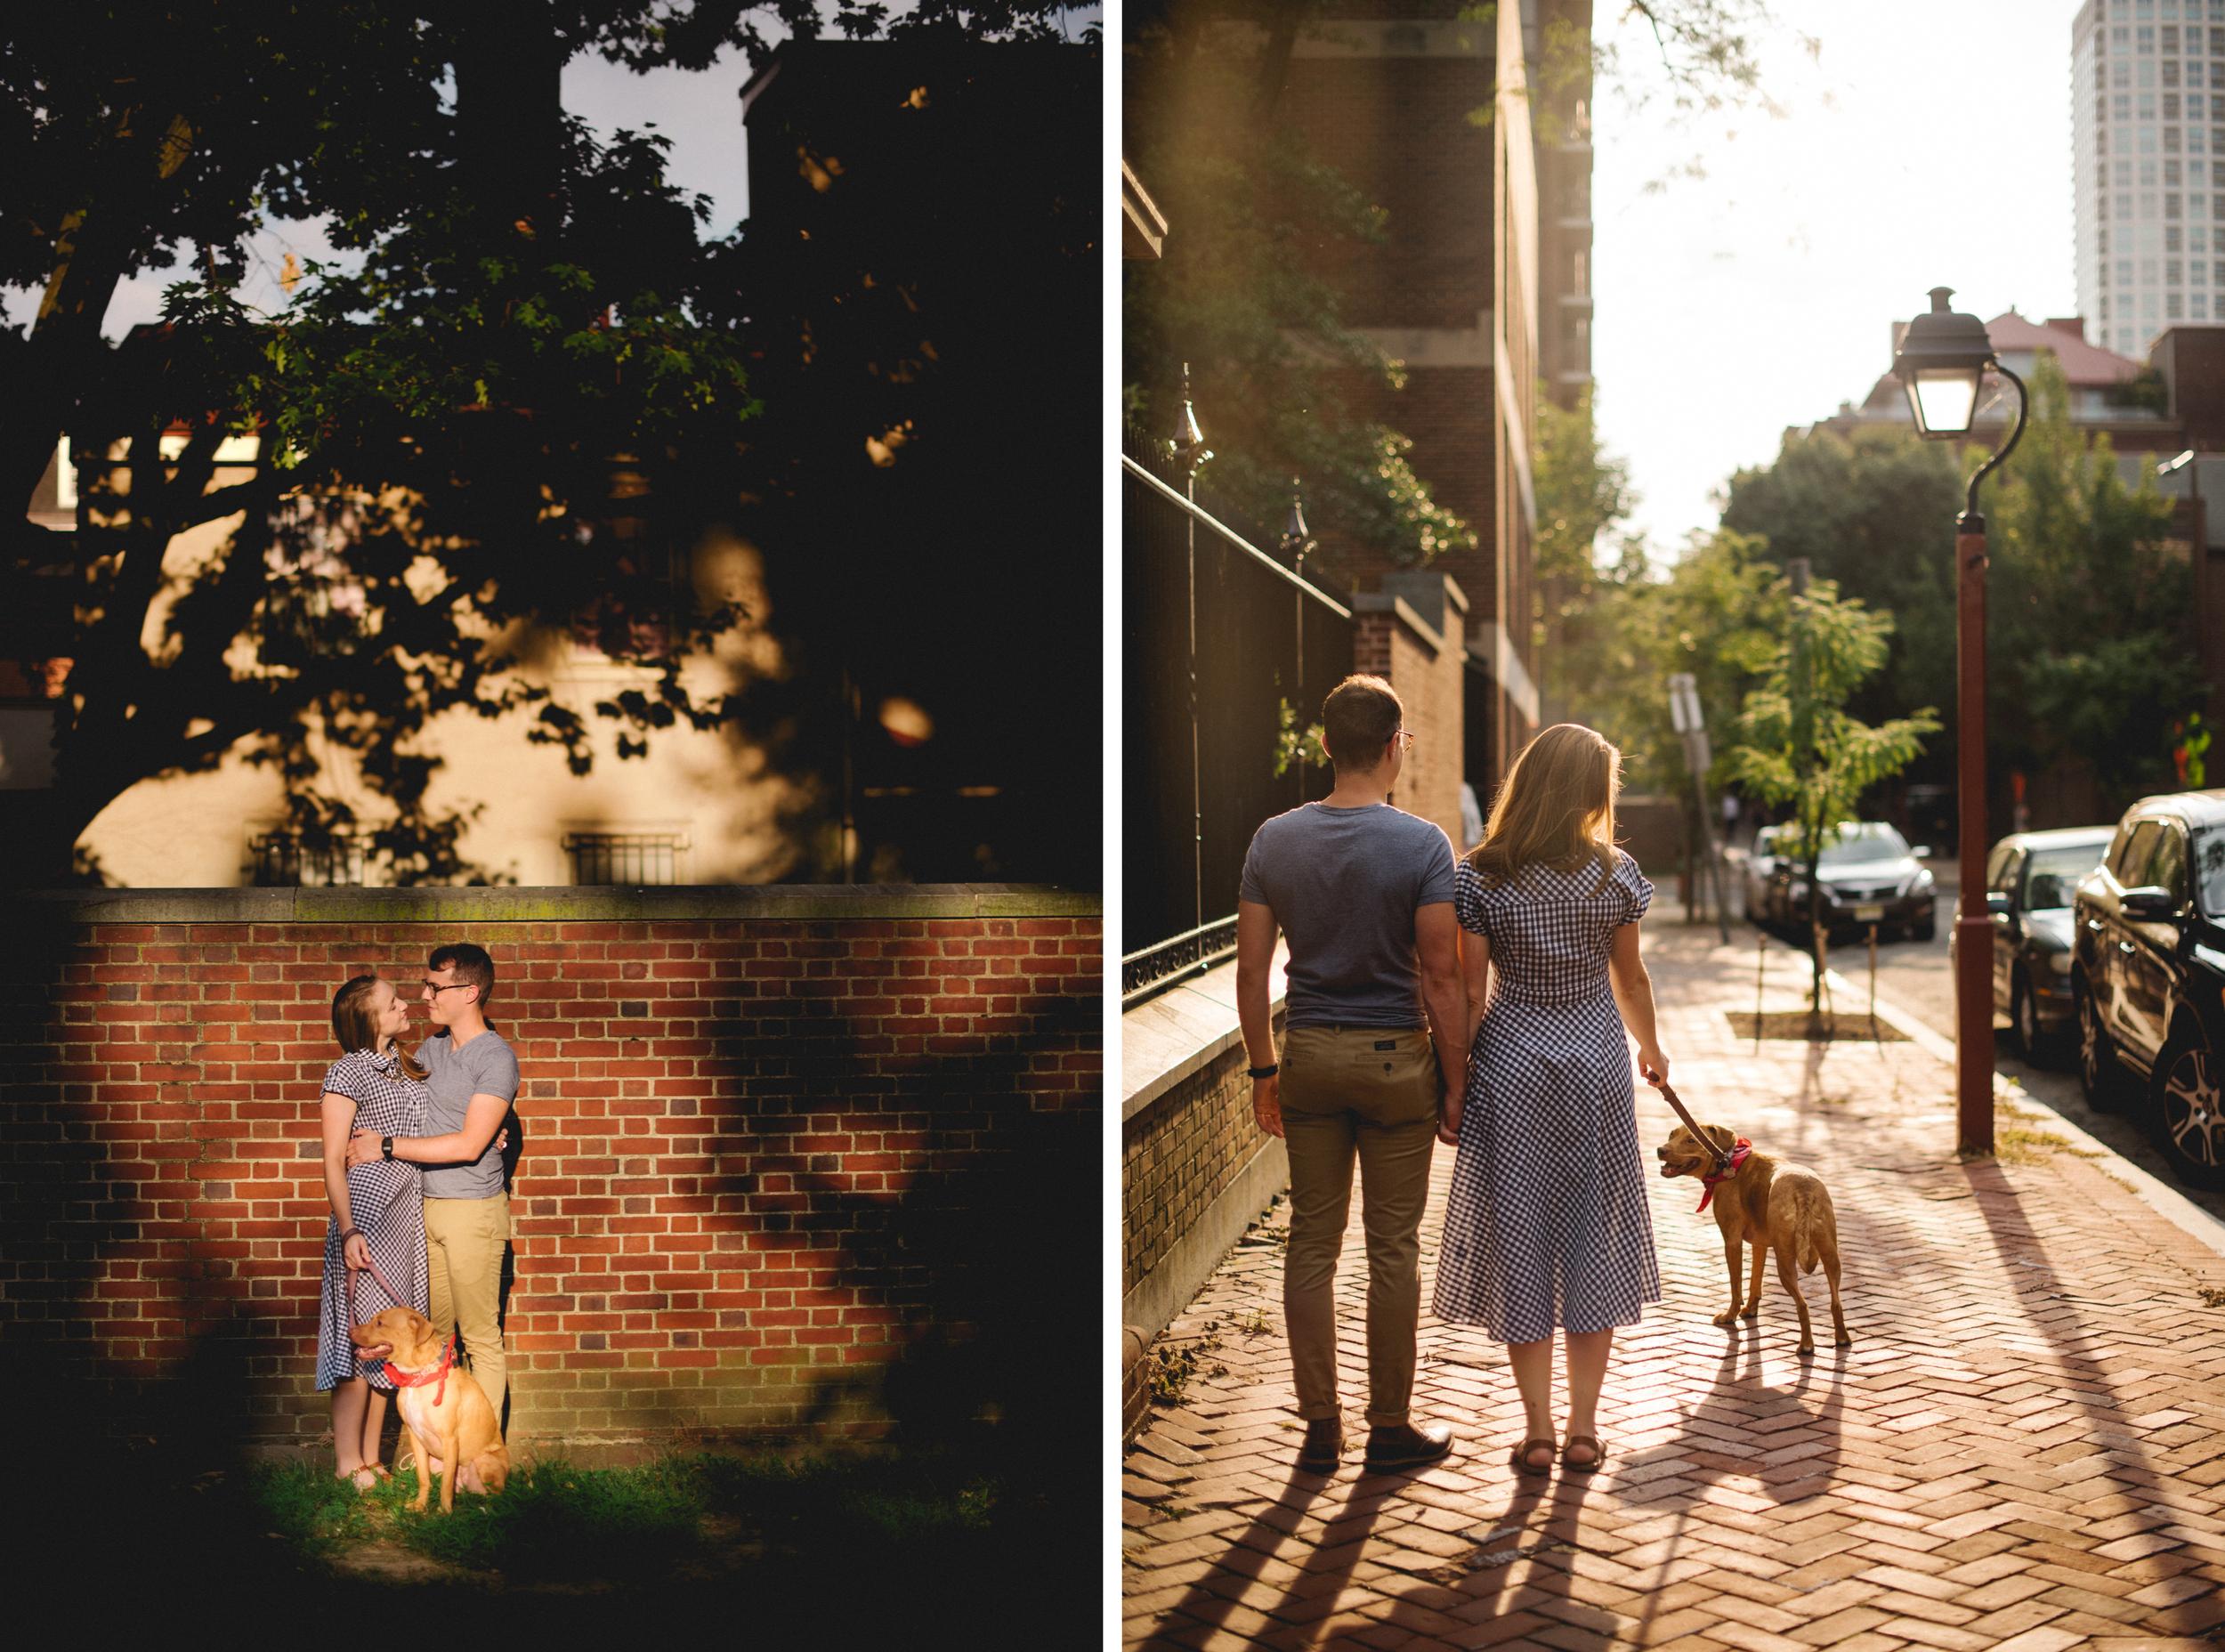 Peaberry-Photography-Society-Hill-Philadelphia-Pennsylvania-Newlyweds-Just-Married-014.jpg